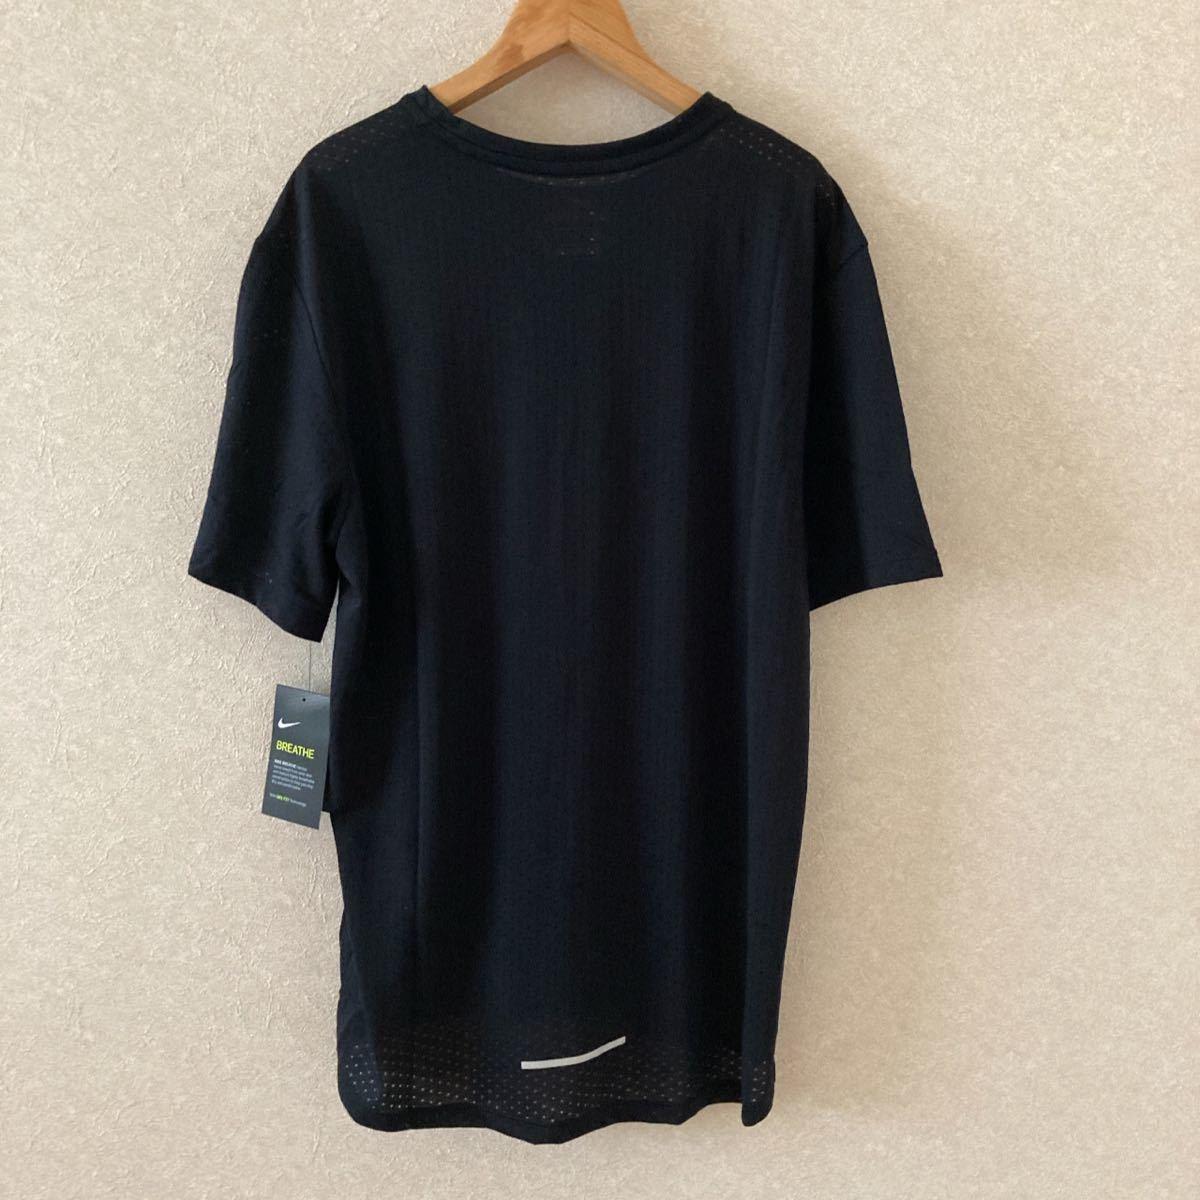 NIKE ナイキ ランニングTシャツ ライズ365 メンズS 定価5500円税込